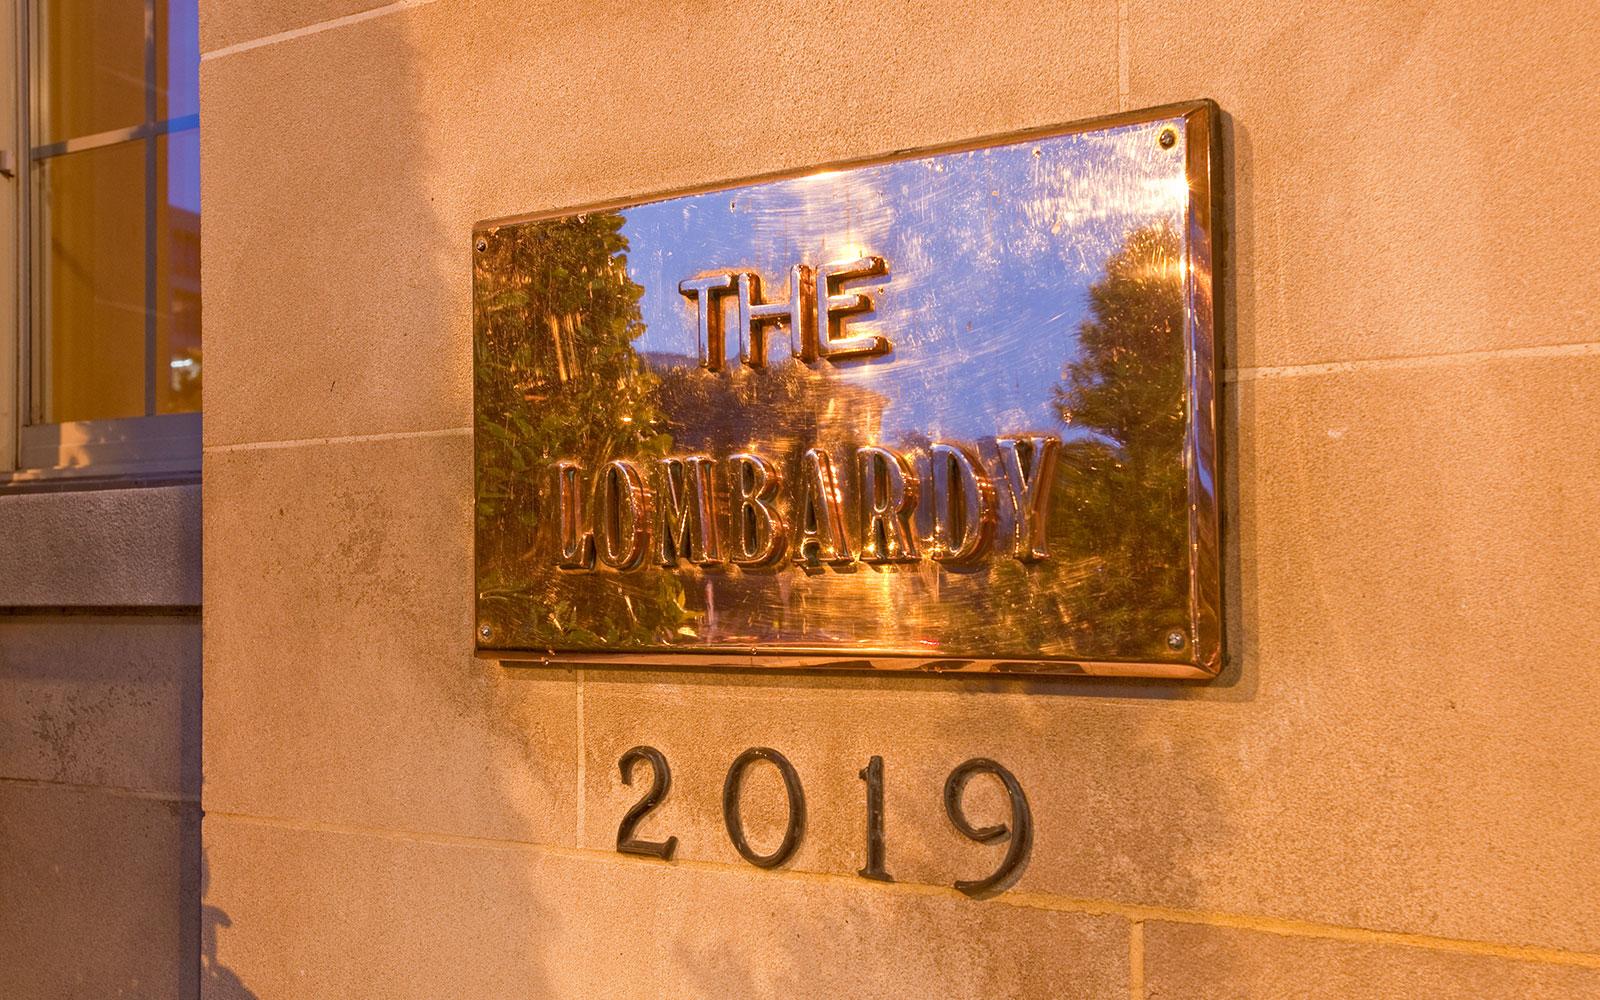 Hotel Lombardy, Washington D.C. Signboard